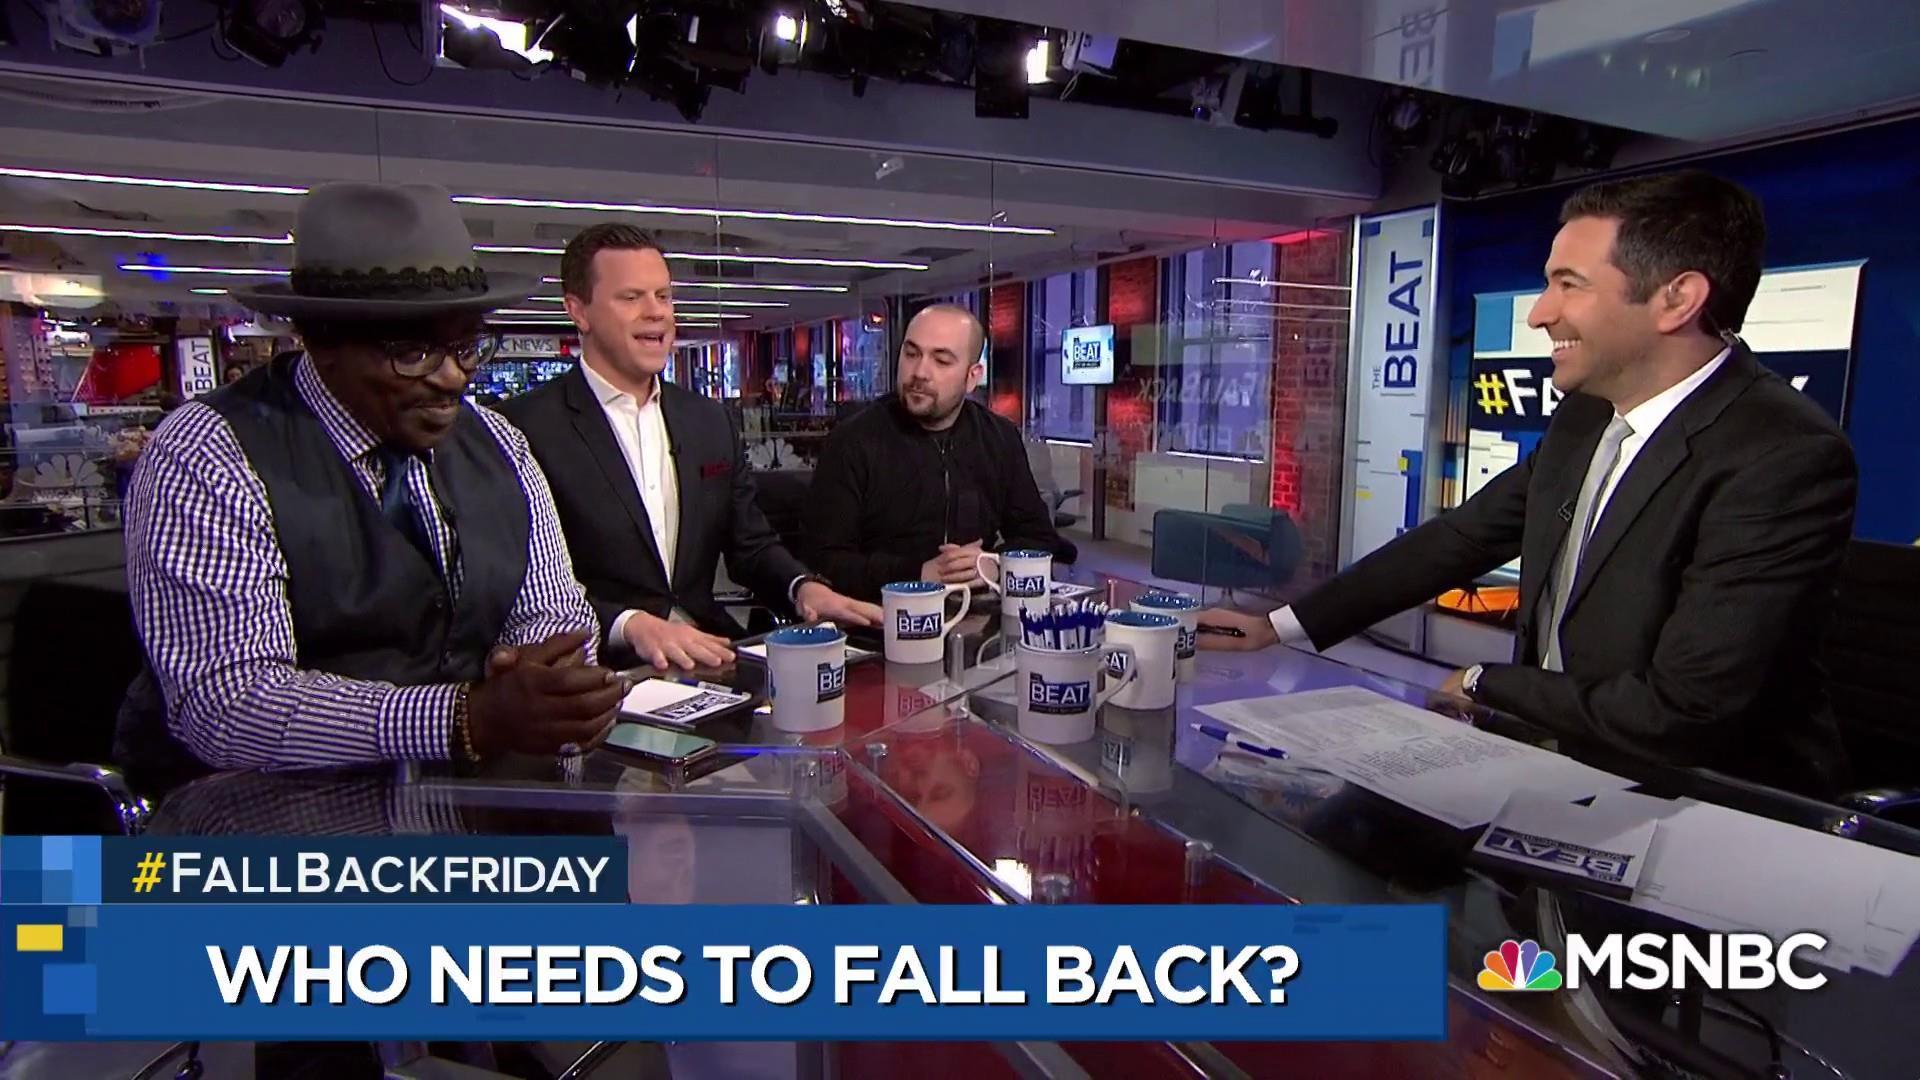 Fab 5 Freddy: John Boehner, 'fall back' for ignoring pot convictions